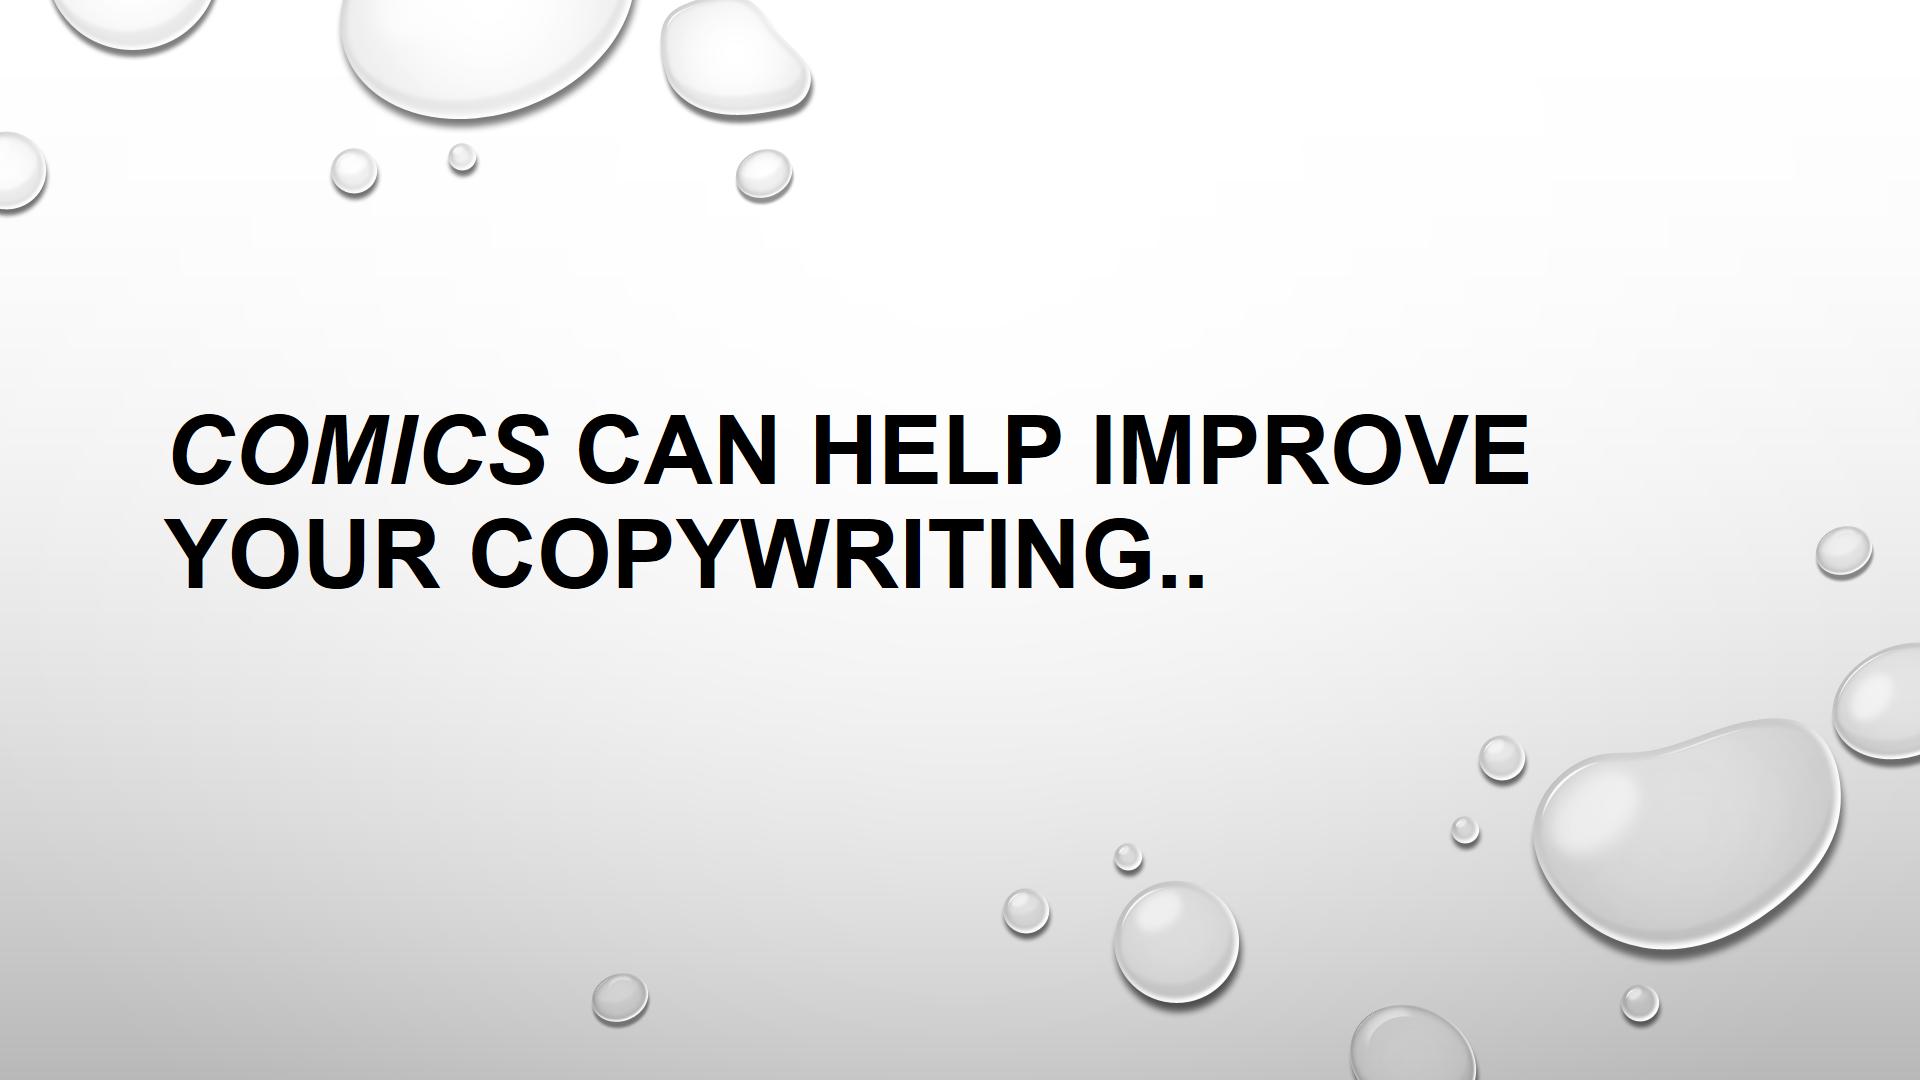 Improve_Copywriting_With_Comics